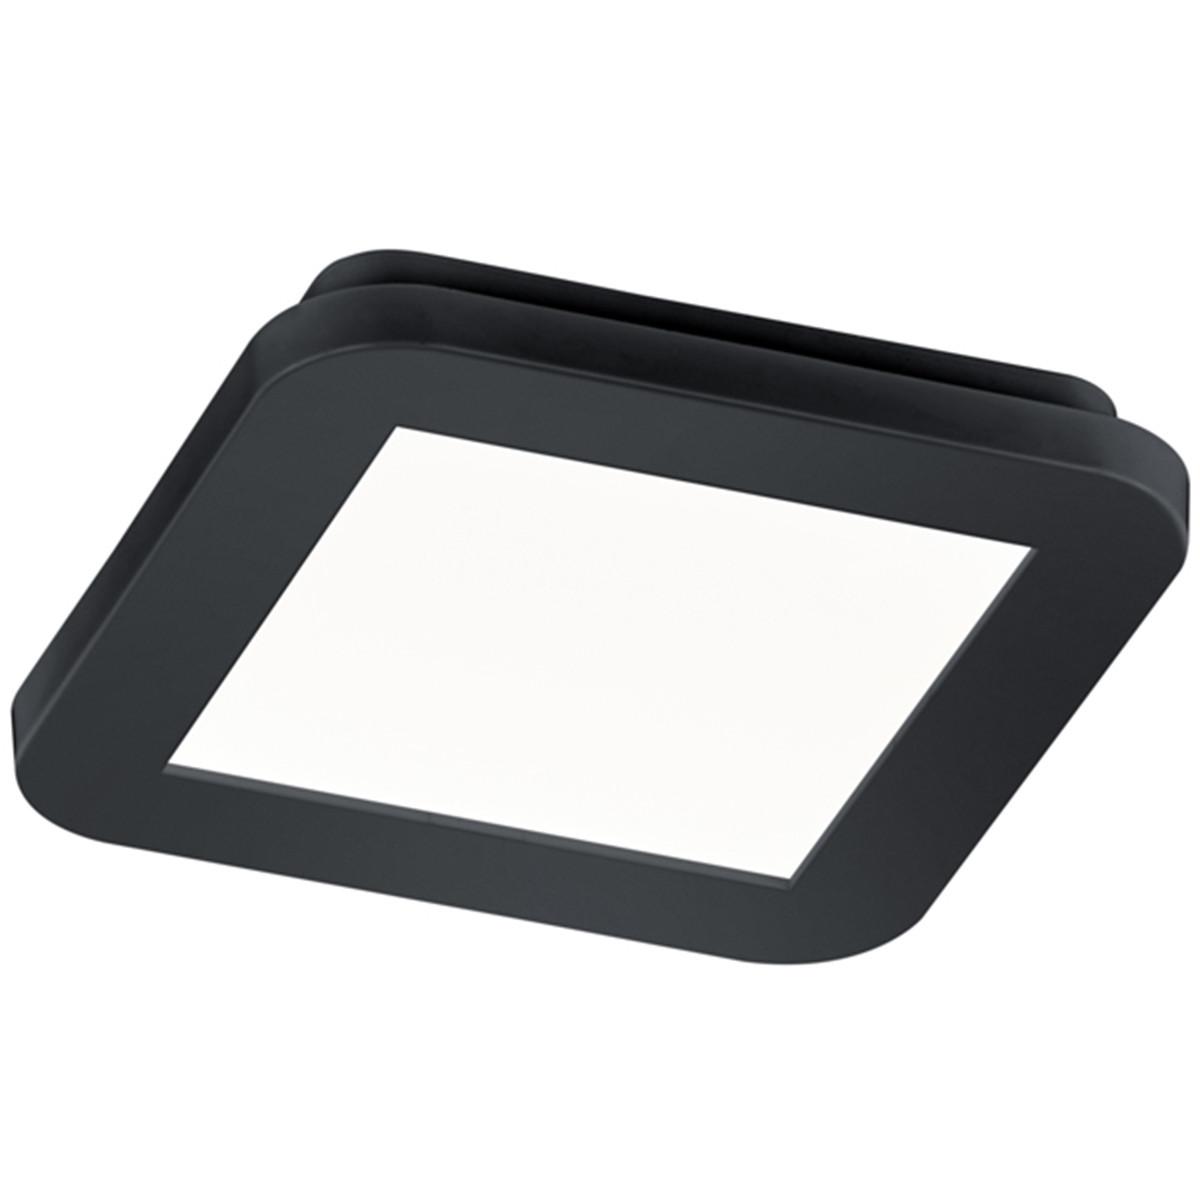 LED Plafondlamp - Trion Camy - Opbouw Vierkant 10W - Spatwaterdicht IP44 - Dimbaar - Warm Wit 3000K